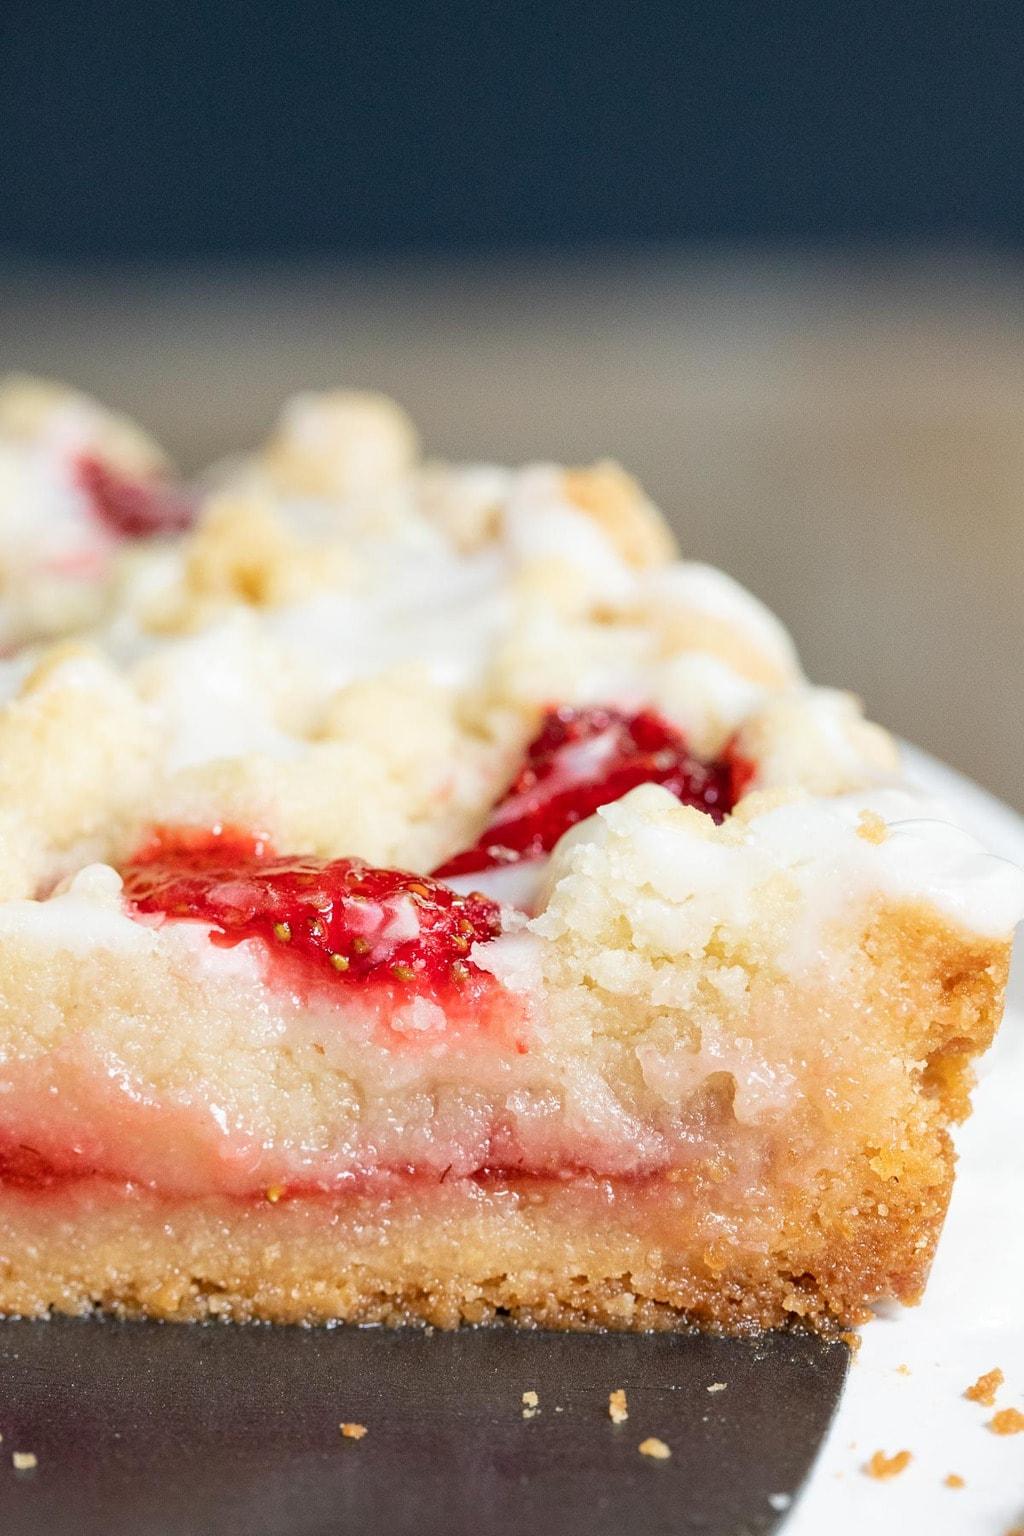 Ultra closeup photo of the inside of a Strawberry Jam Shortbread Tart.